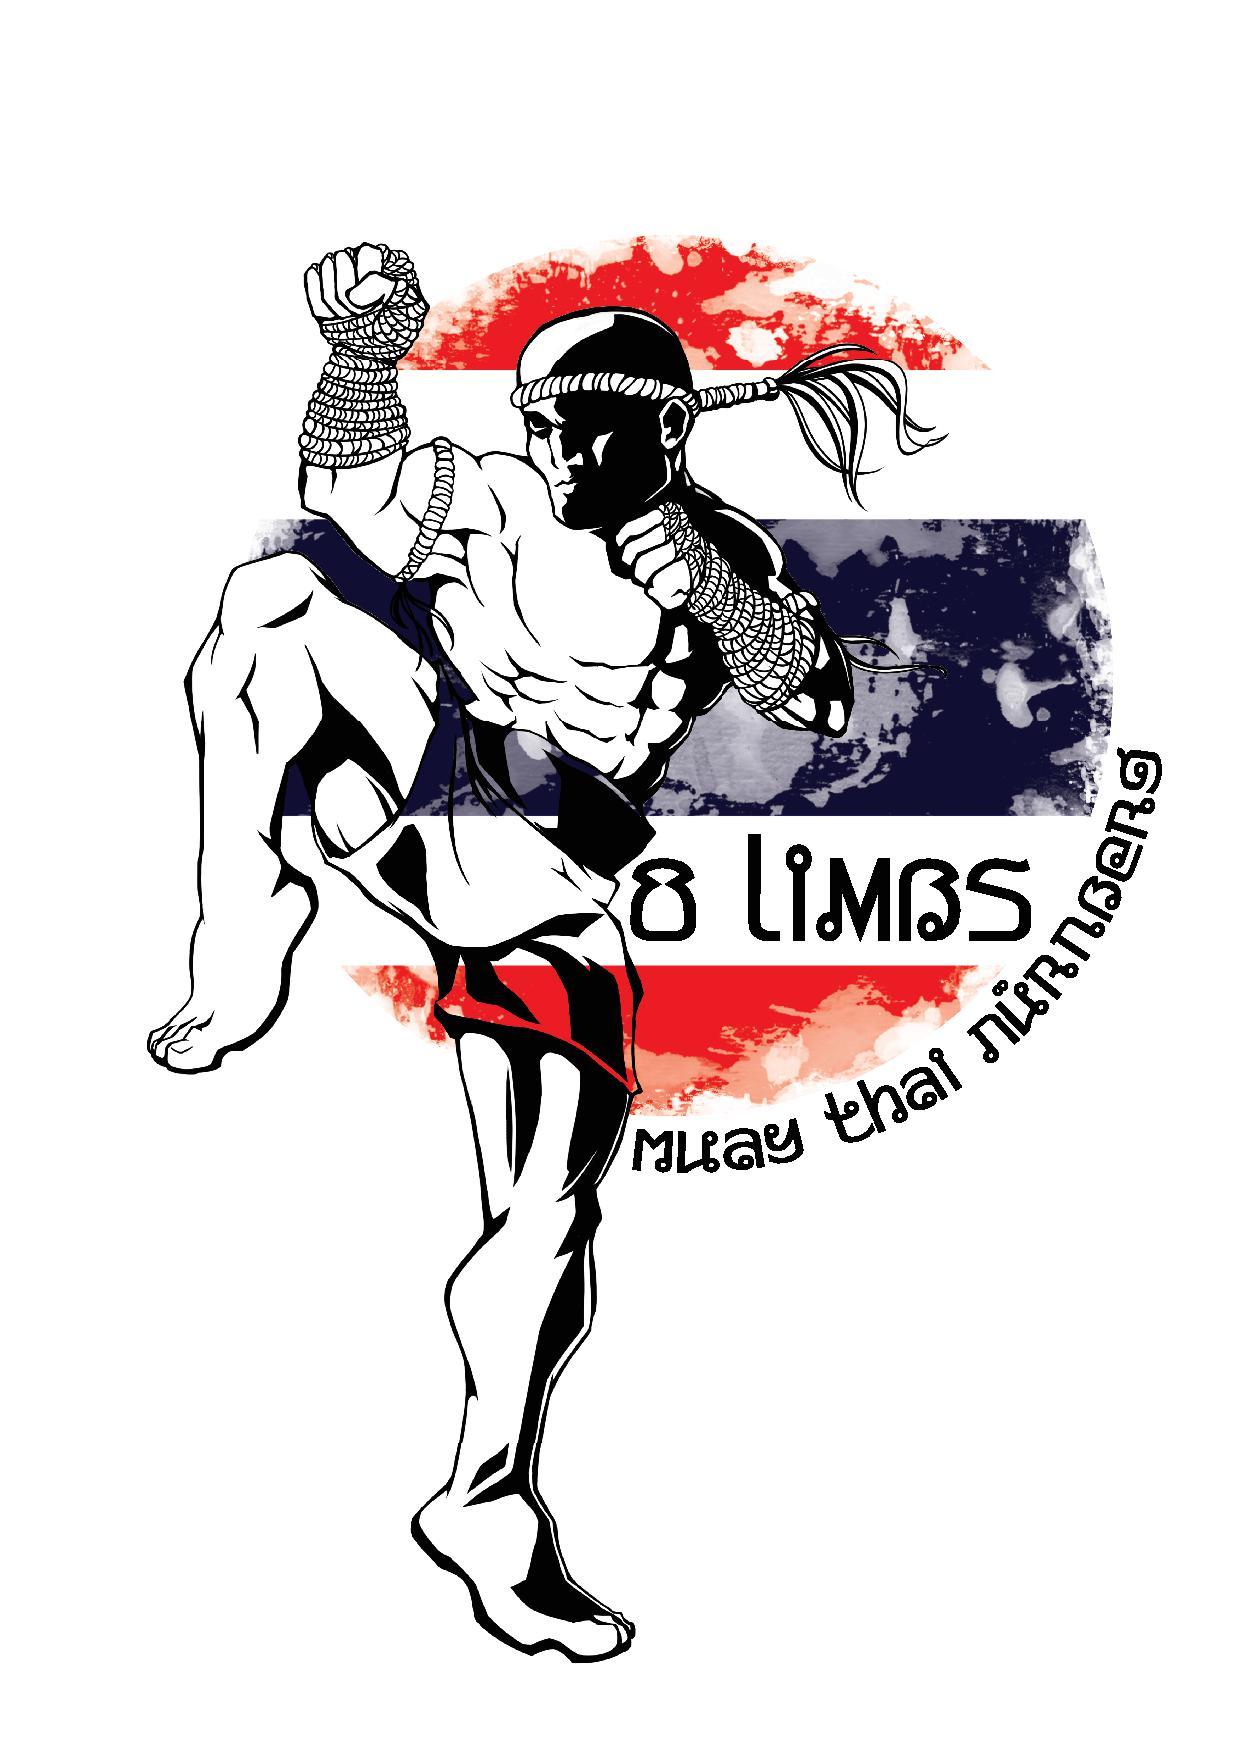 8Limbs